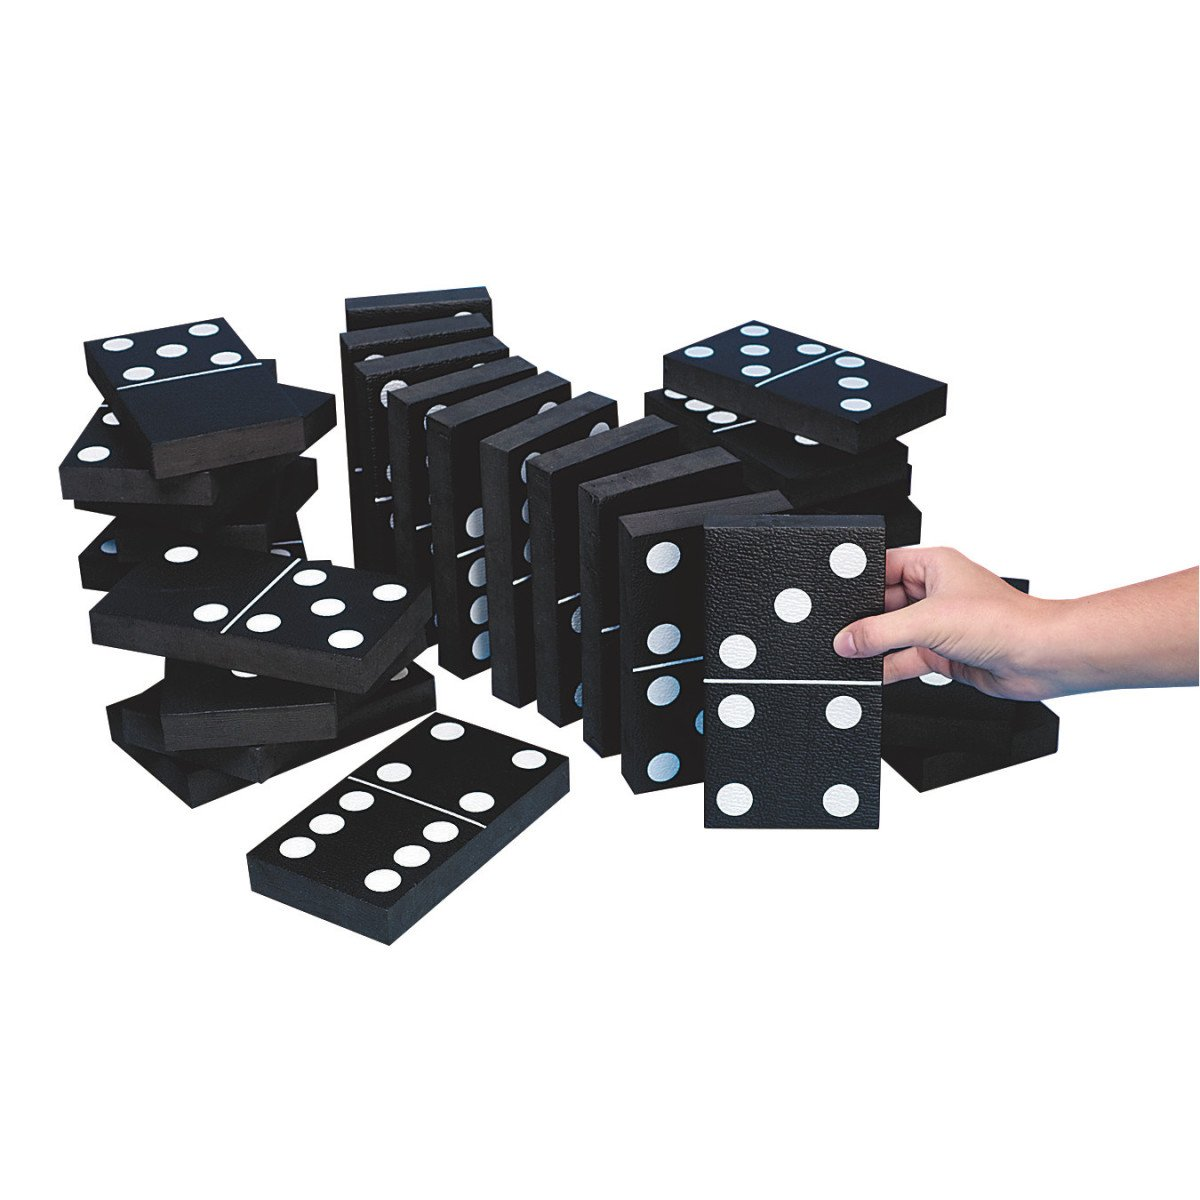 Jumbo Foam Dominoes Dominoes Dominoes by S&S Worldwide a60b67